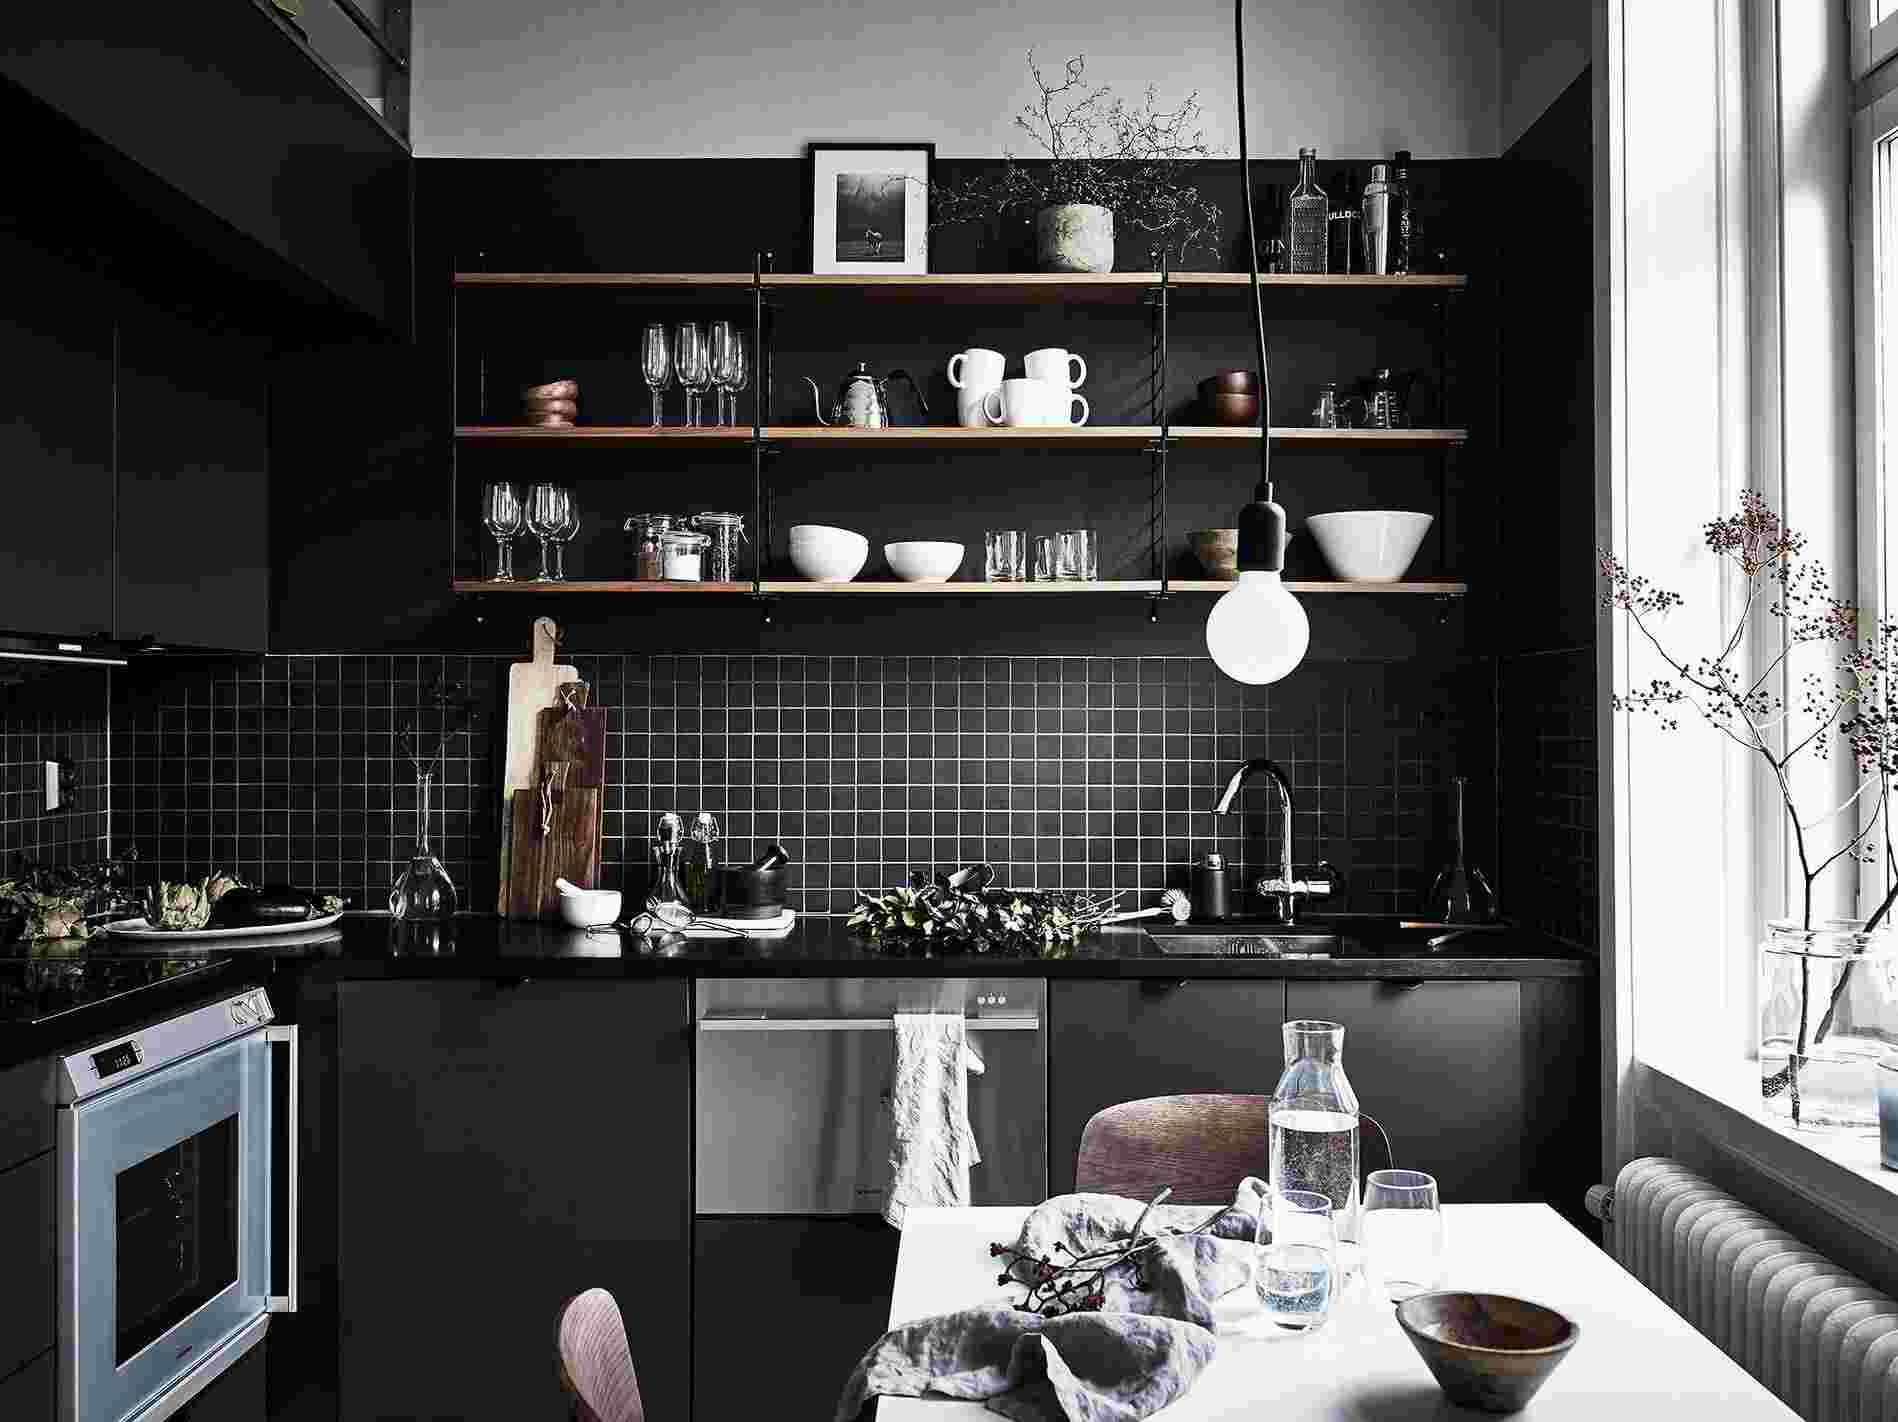 Cocinas negras sofisticadas elegantes y atrevidas for Decoracion paredes cocinas modernas